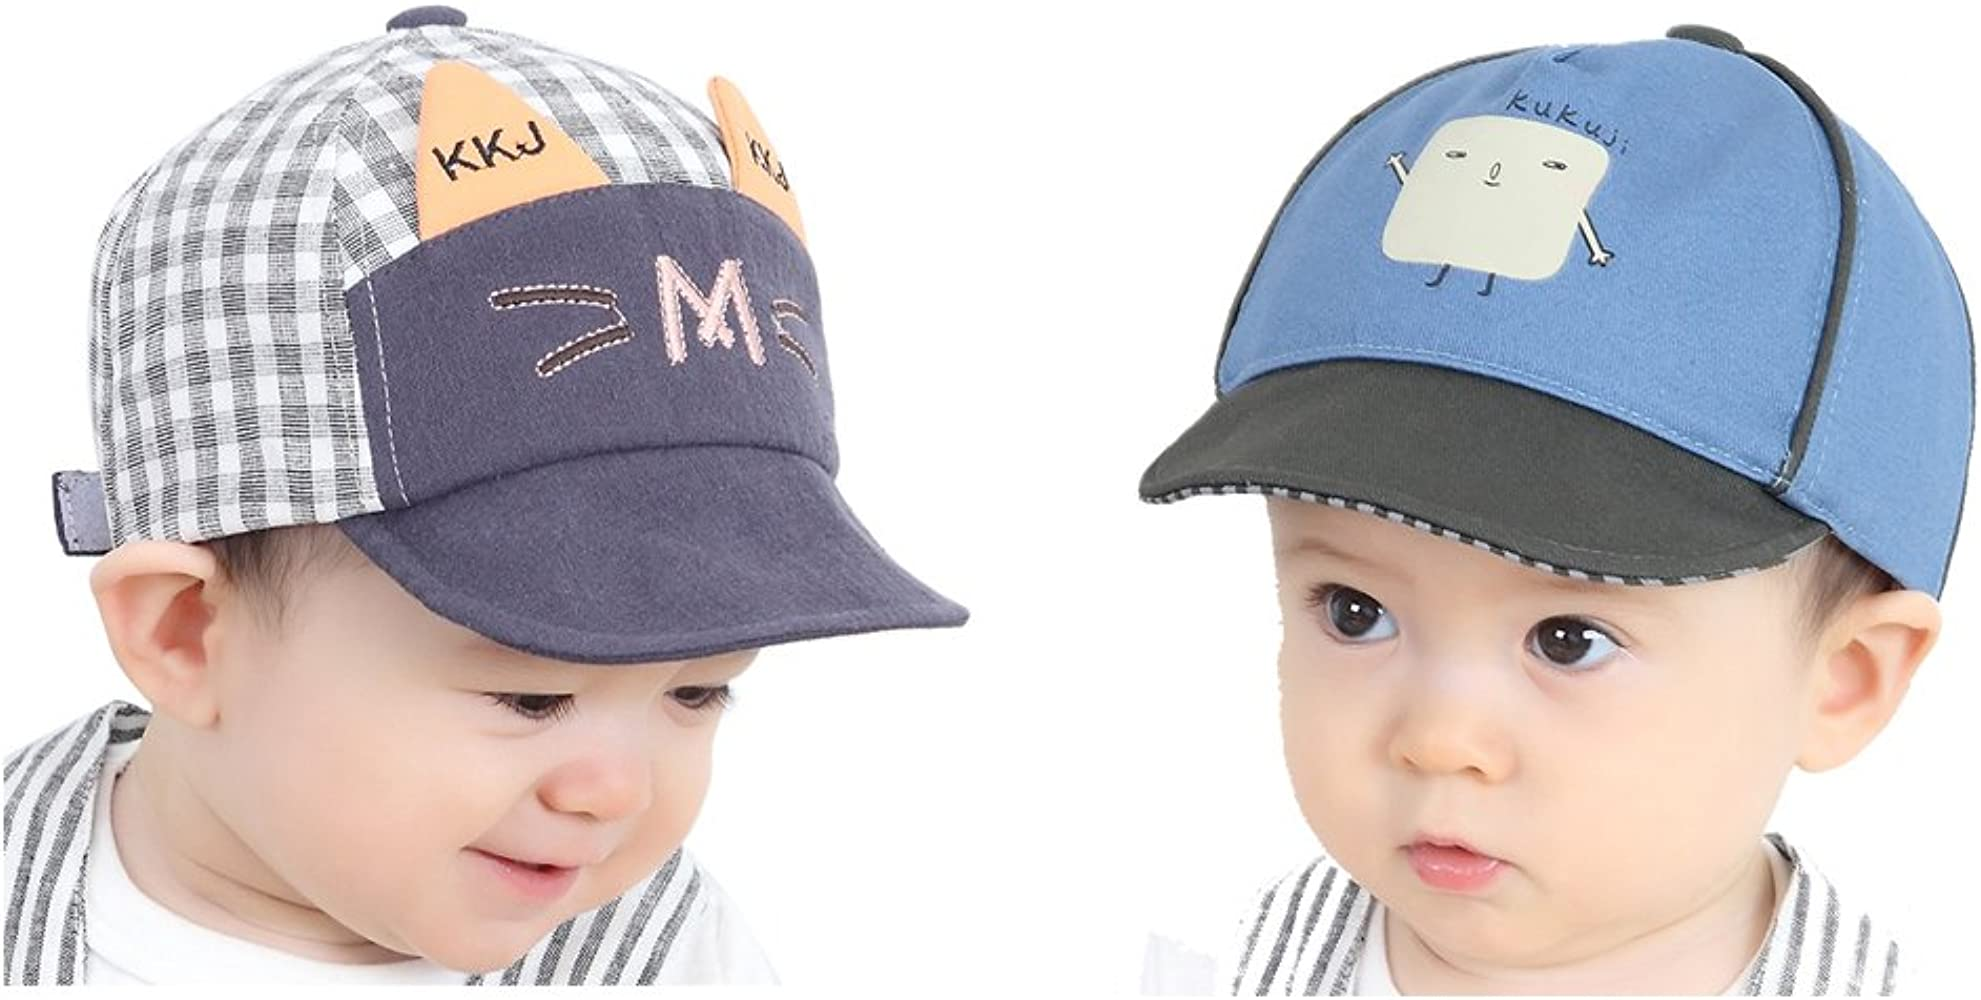 Infant Toddler Kids Baseball Cap Keepersheep Baby Baseball Cap Infant Sun Hat